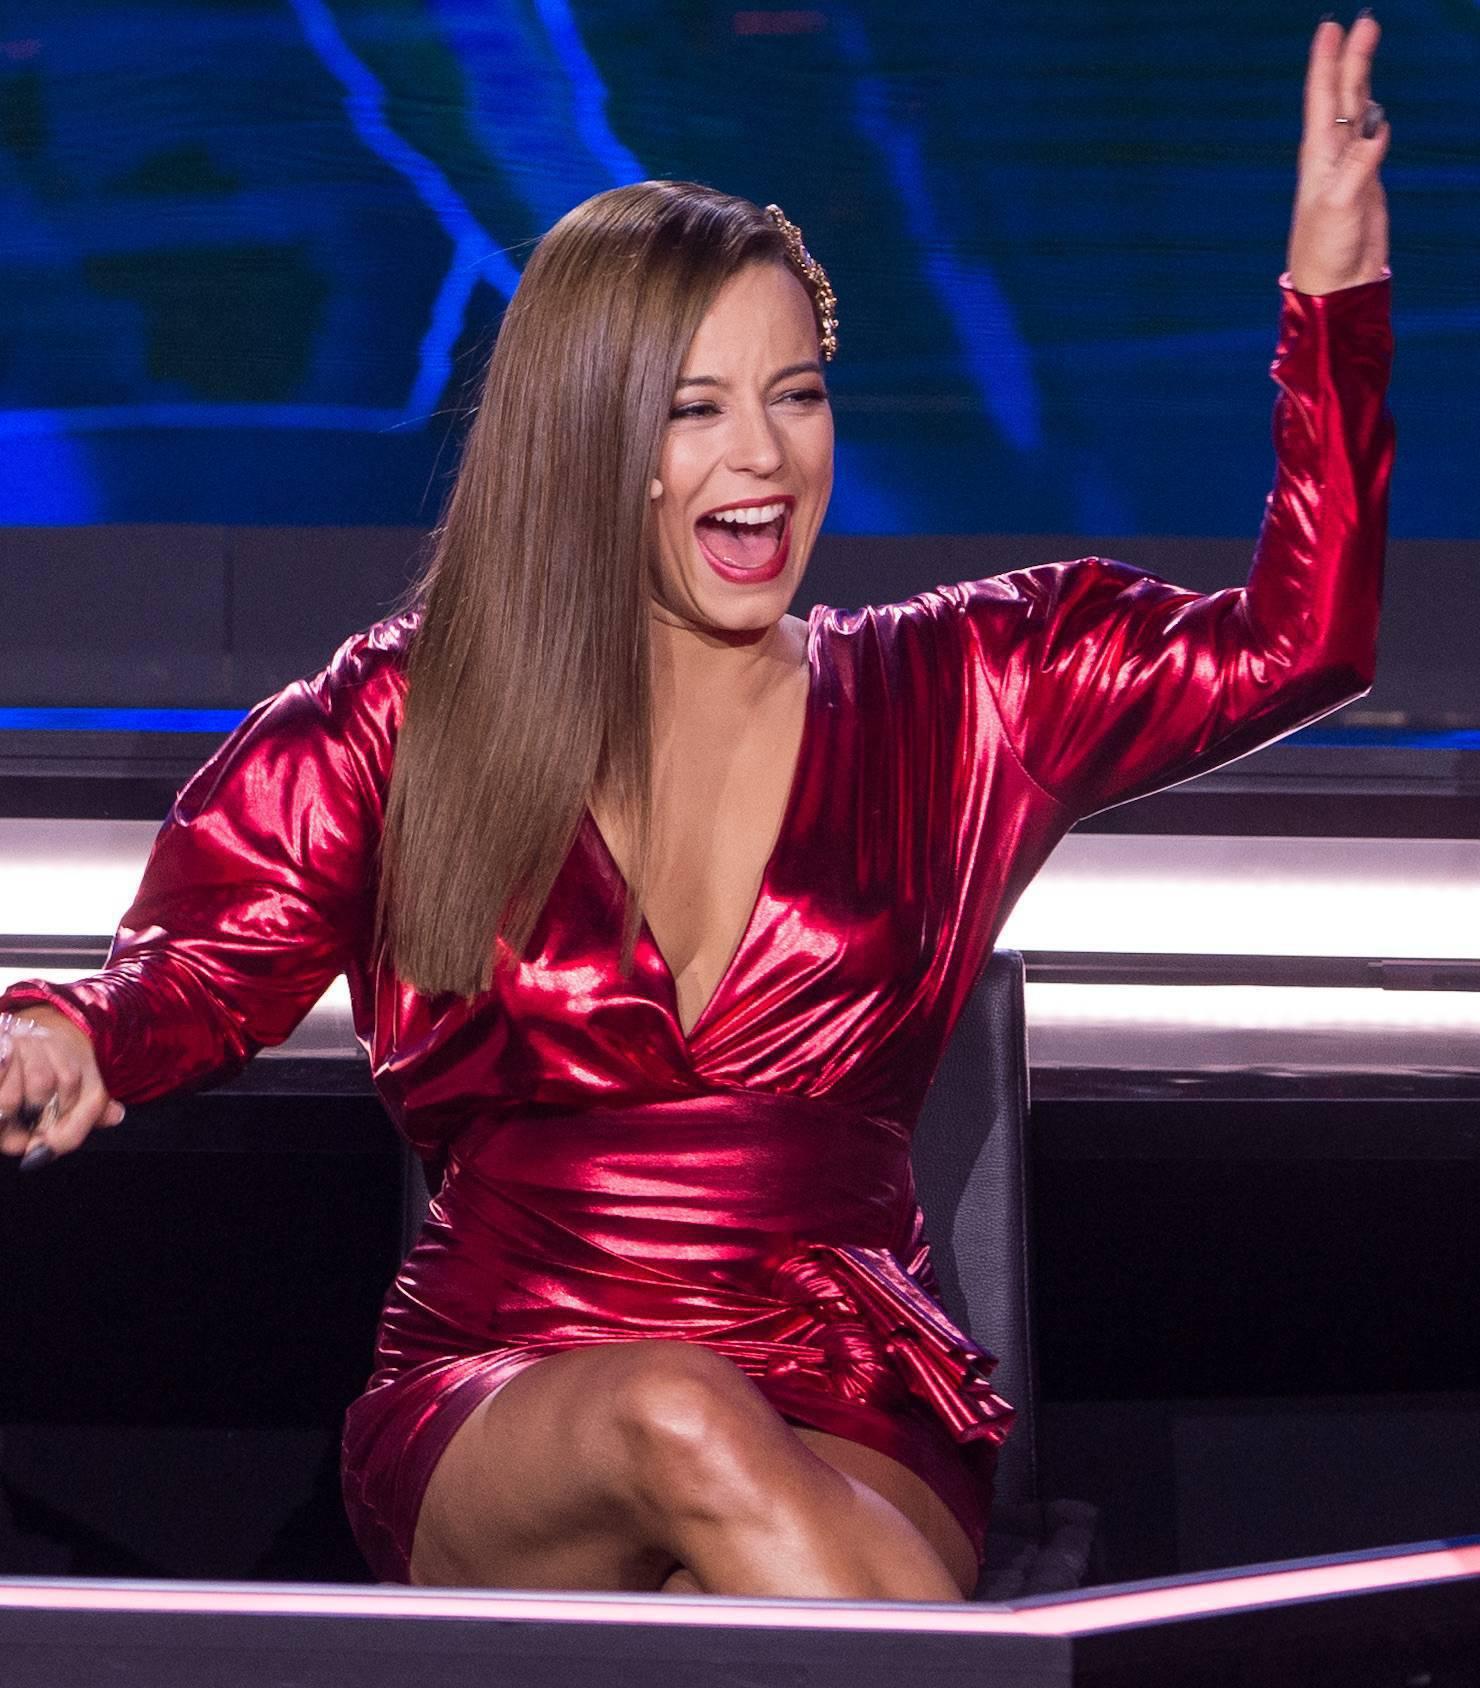 Anna Mucha w czerwonej mini – Dance Dance Dance 2